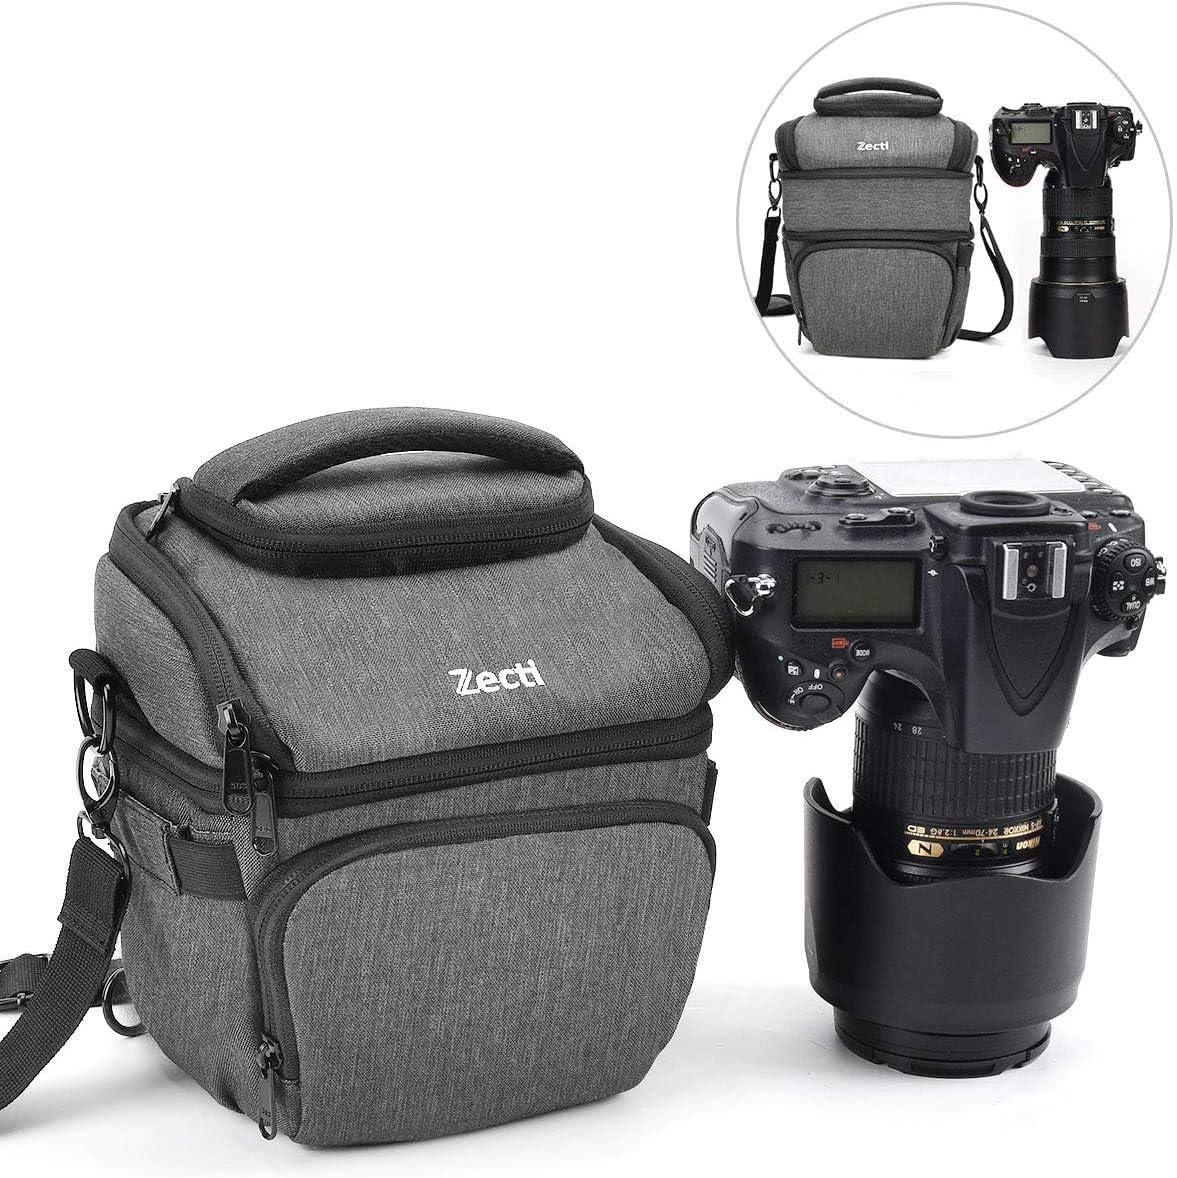 Dslr Kameratasche Zecti Fototasche Für Kamera